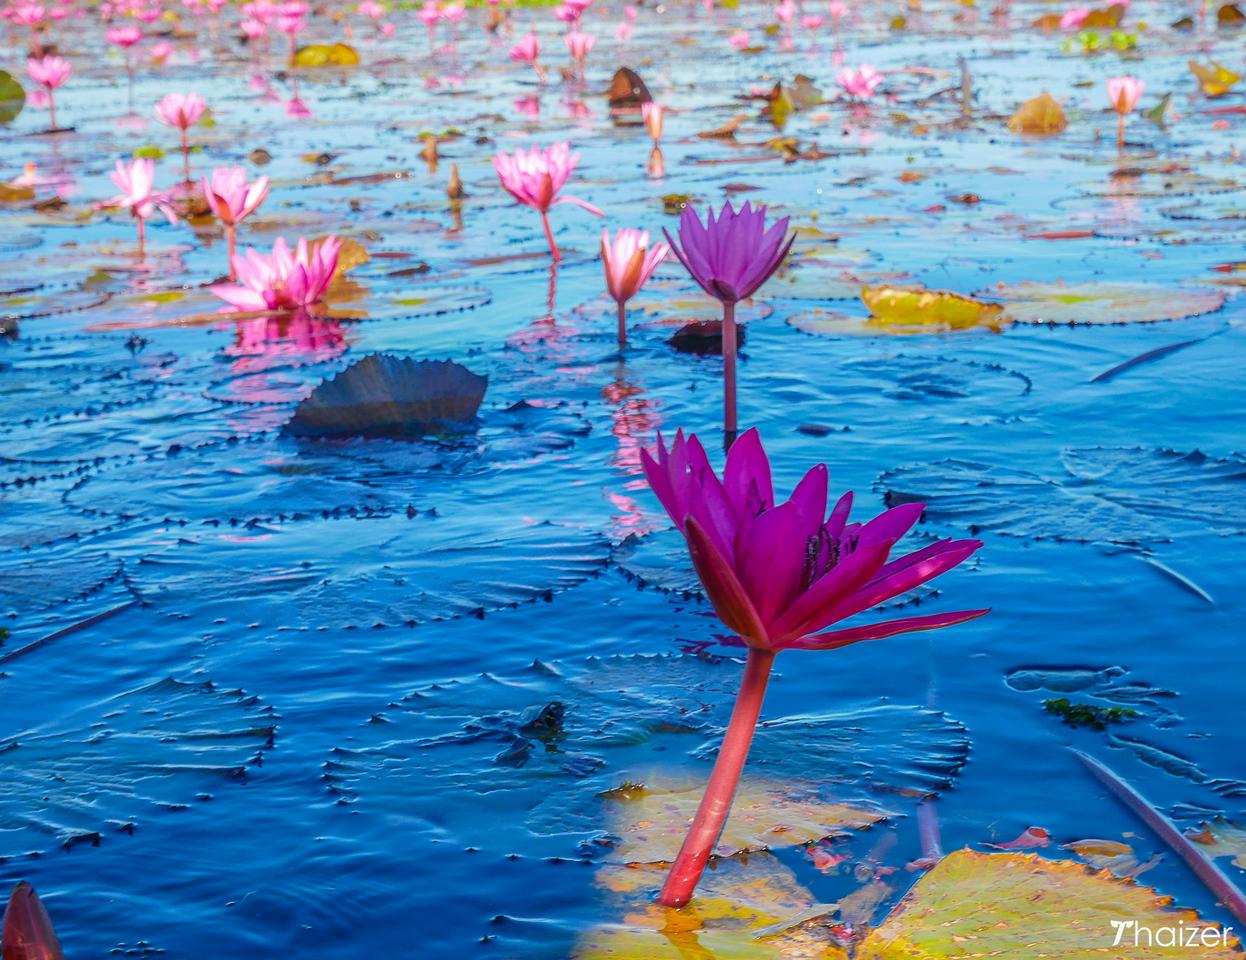 tropical wtaer lilies on Nong Han Kumphawapi Lake, Udon Thani